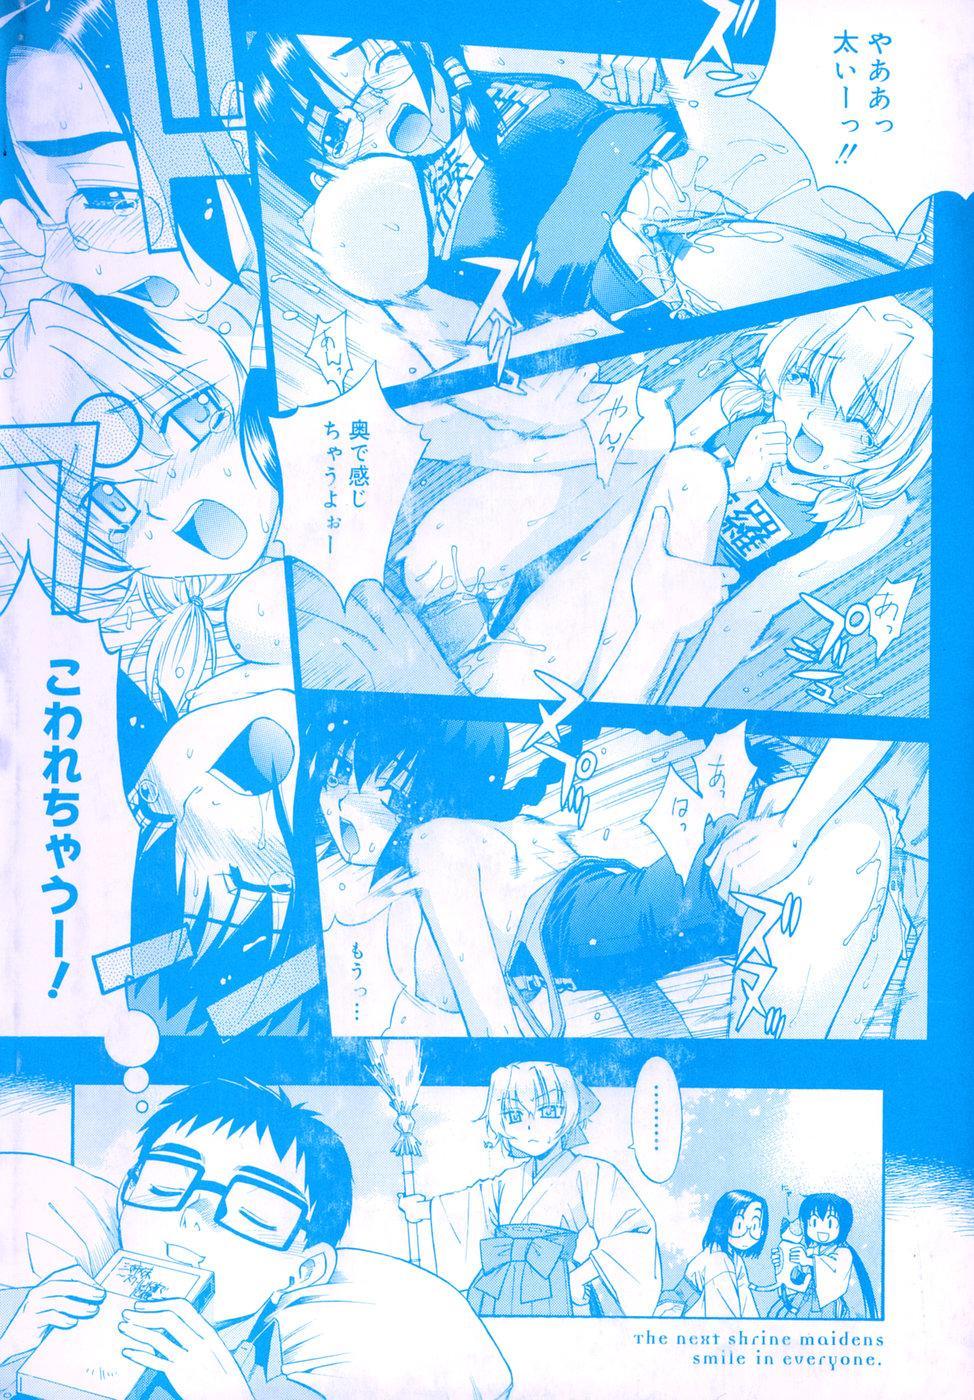 [Yaya Hinata] Tonari no Miko-san wa Minna Warau - The next shrine maidens smile in everyone. 220